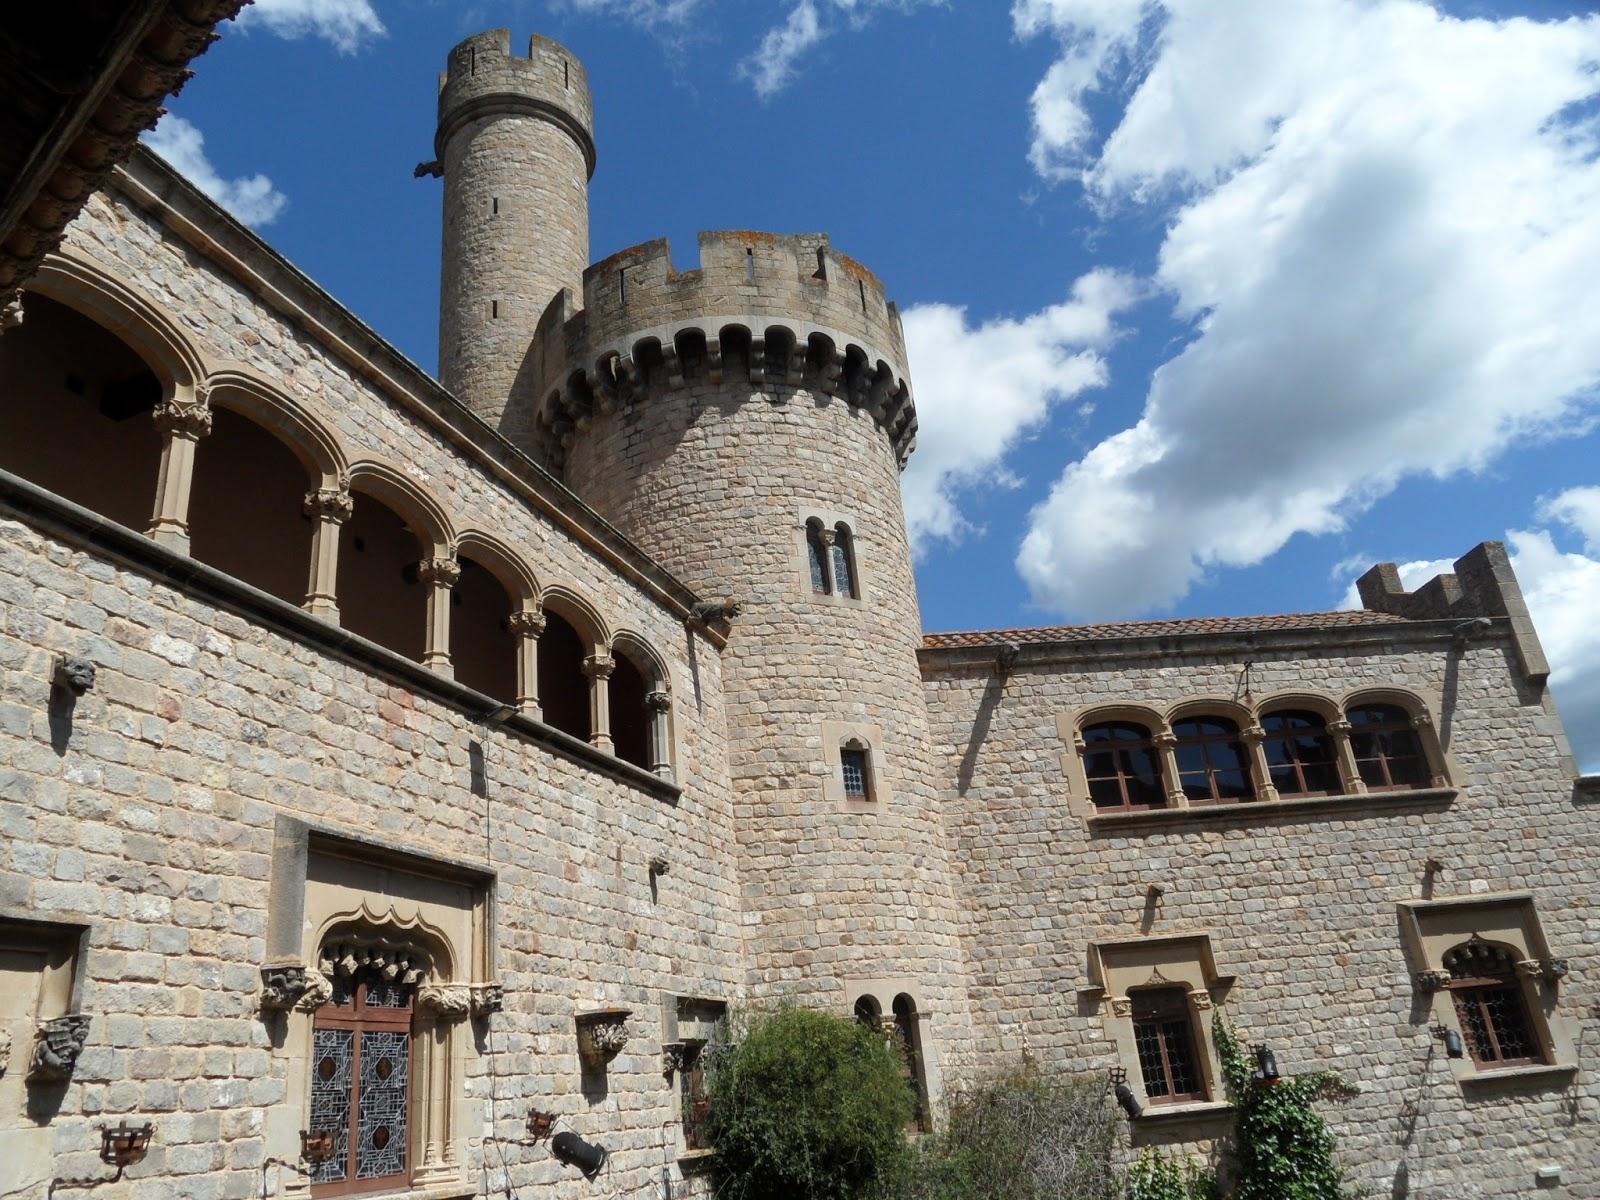 El jardin de las mariposas castell de santa florentina for Jardines nova canet